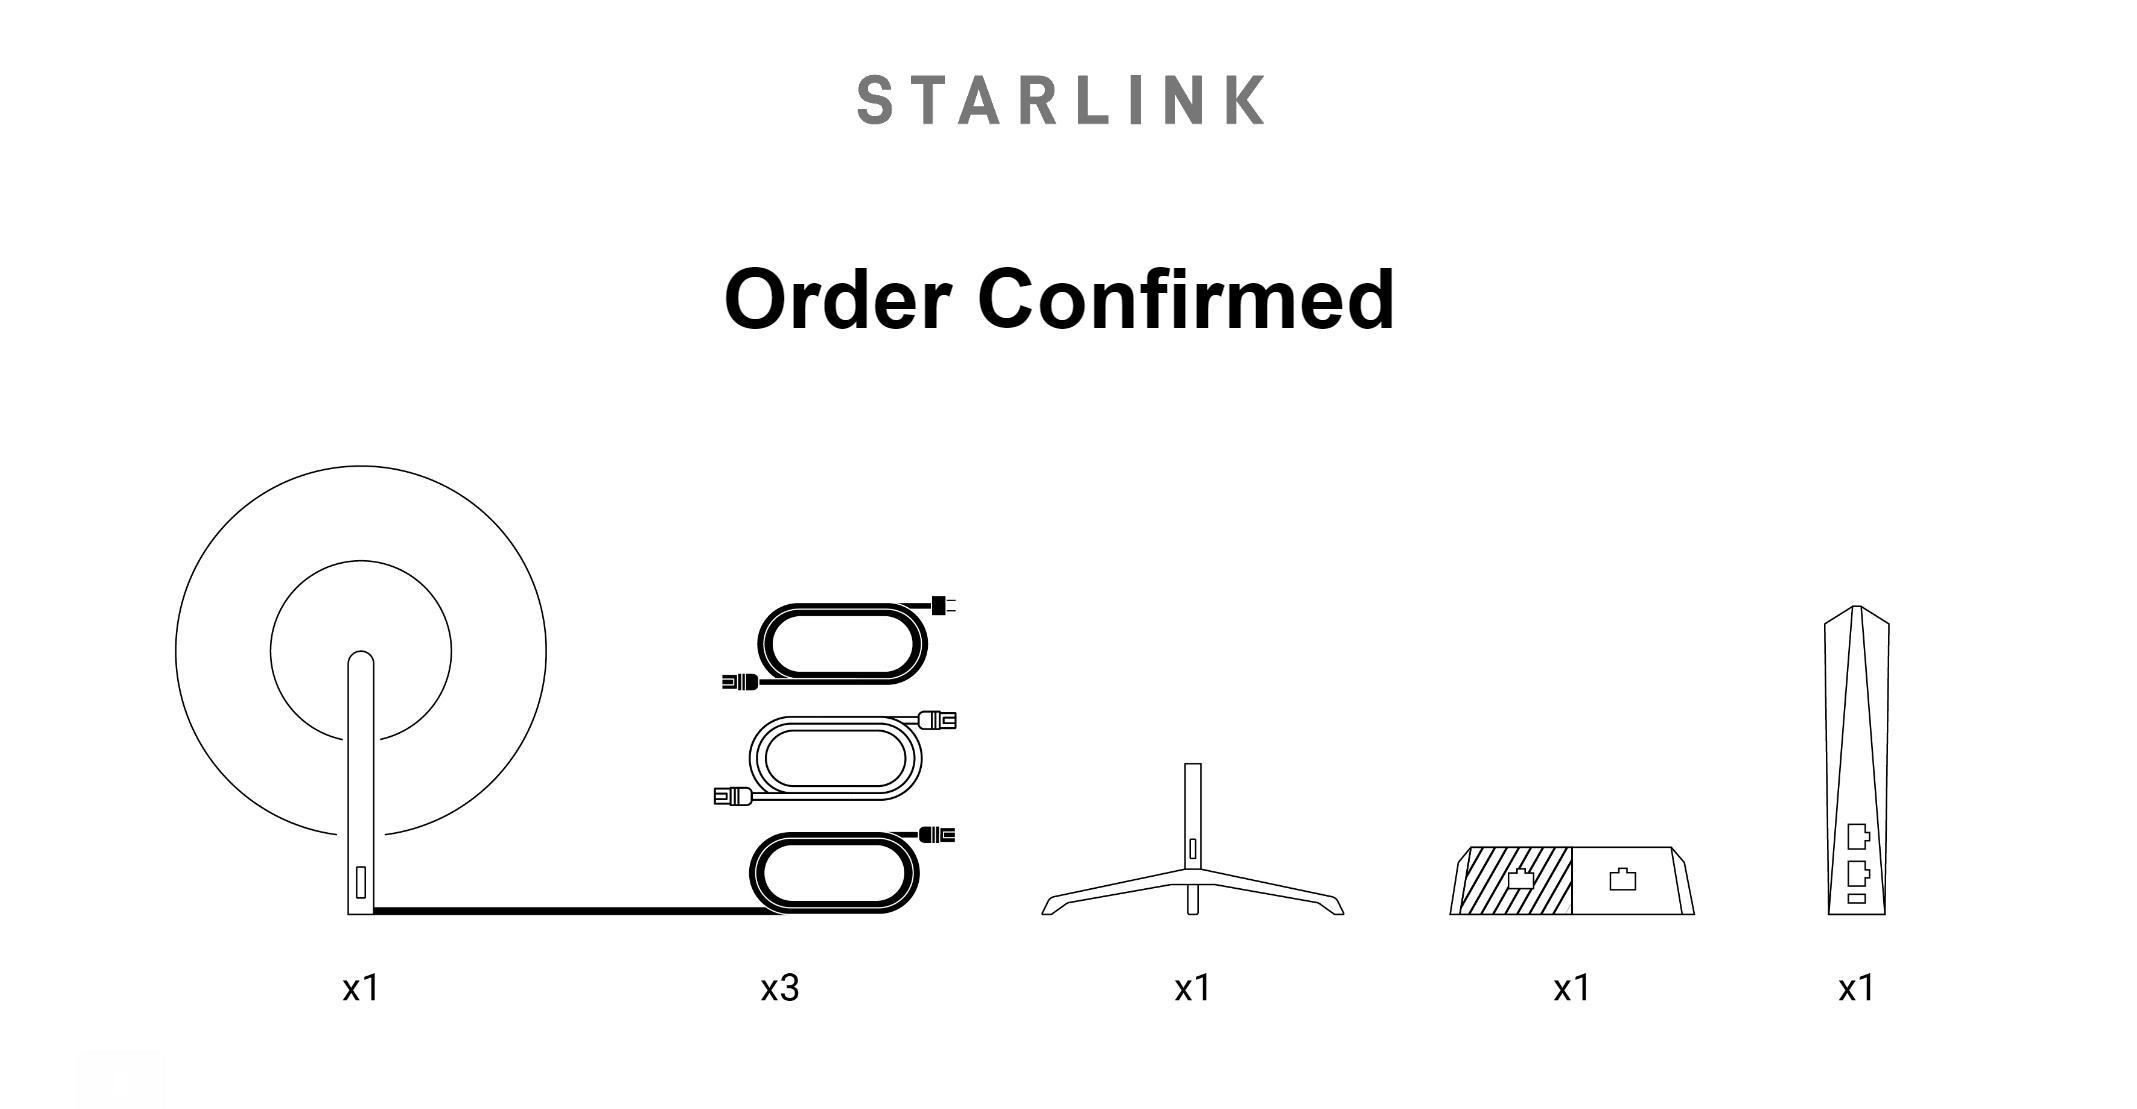 Starlink order confirmed Feb 2021 (Teslarati) 1